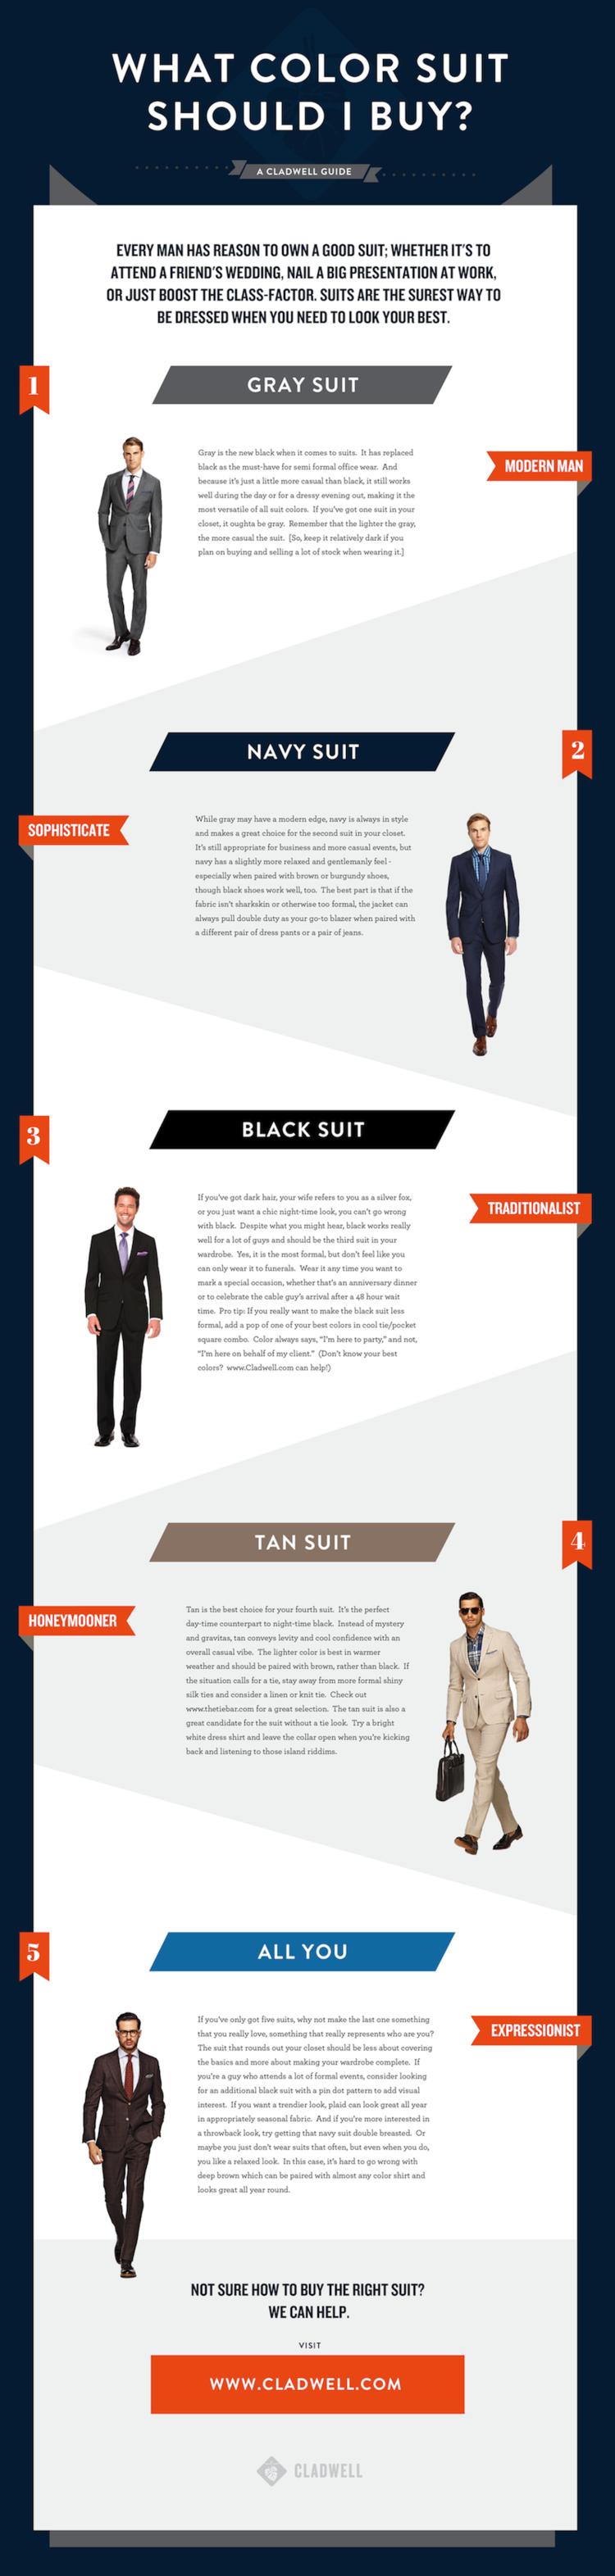 What Color Suit Should I Buy? Men's Suit Coloring Guide — Cladwell